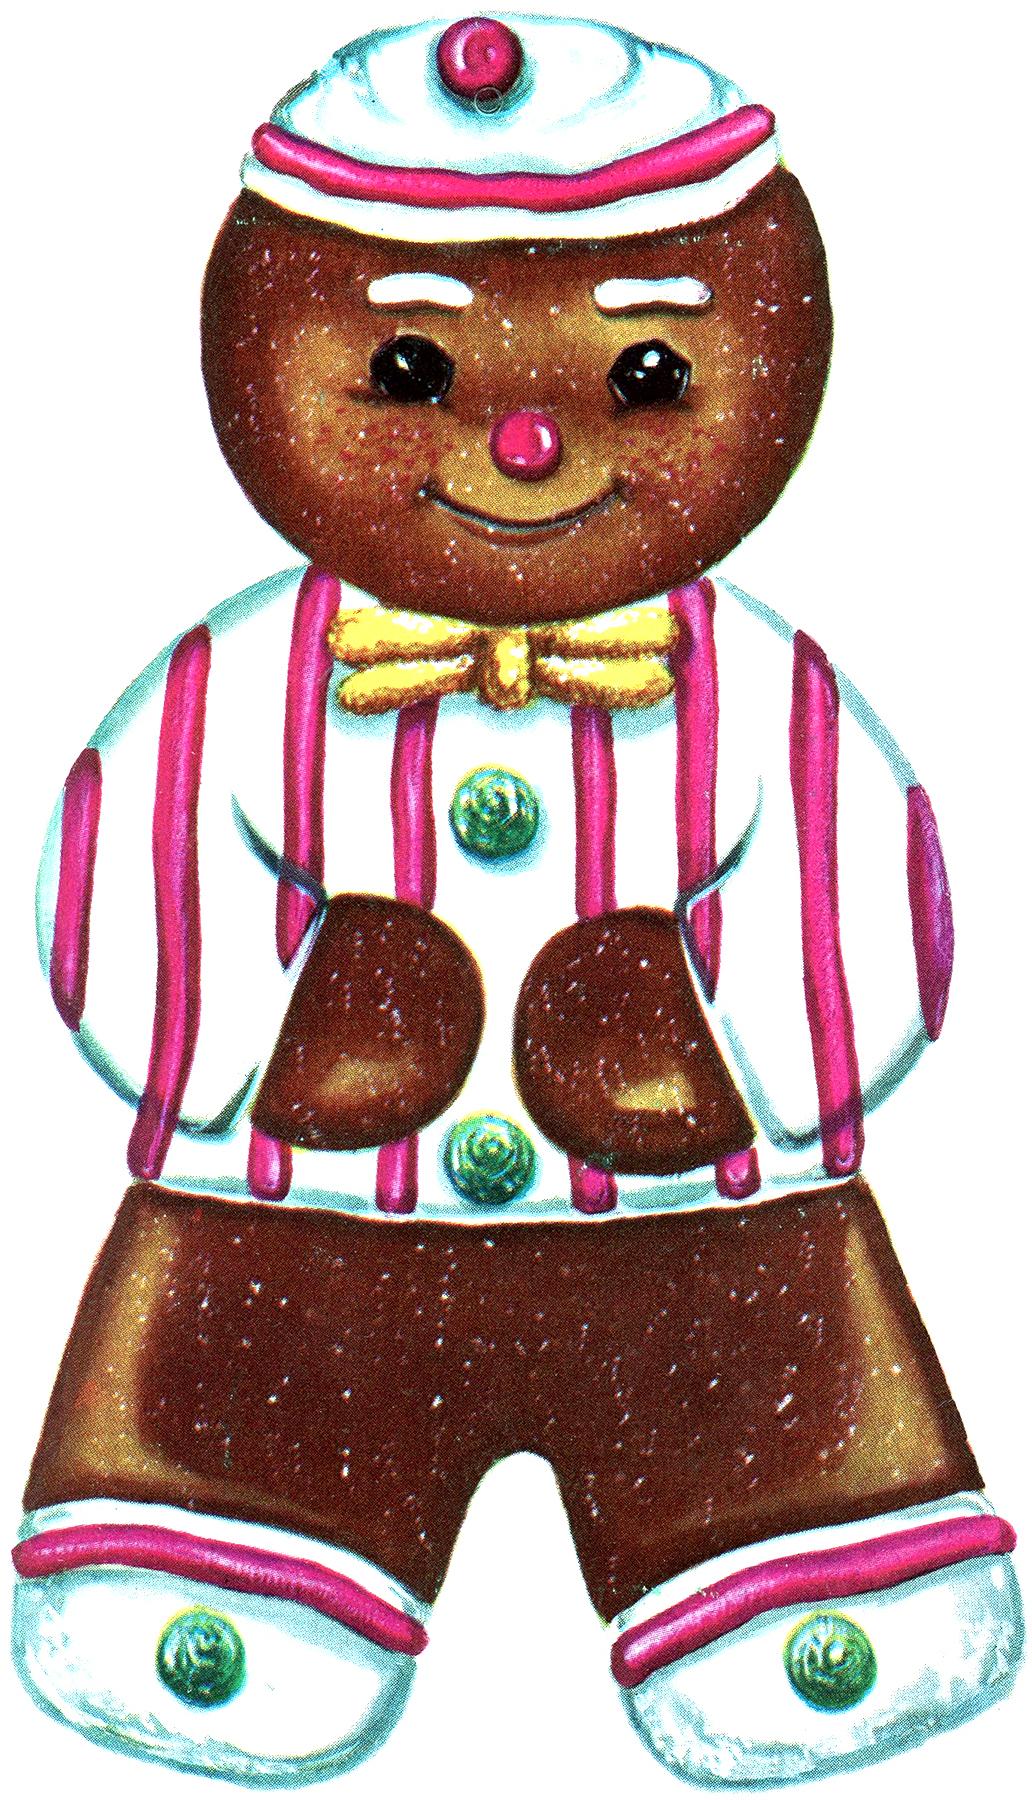 Printable Ornaments Gingerbread Man & Retro Bird - The Graphics Fairy